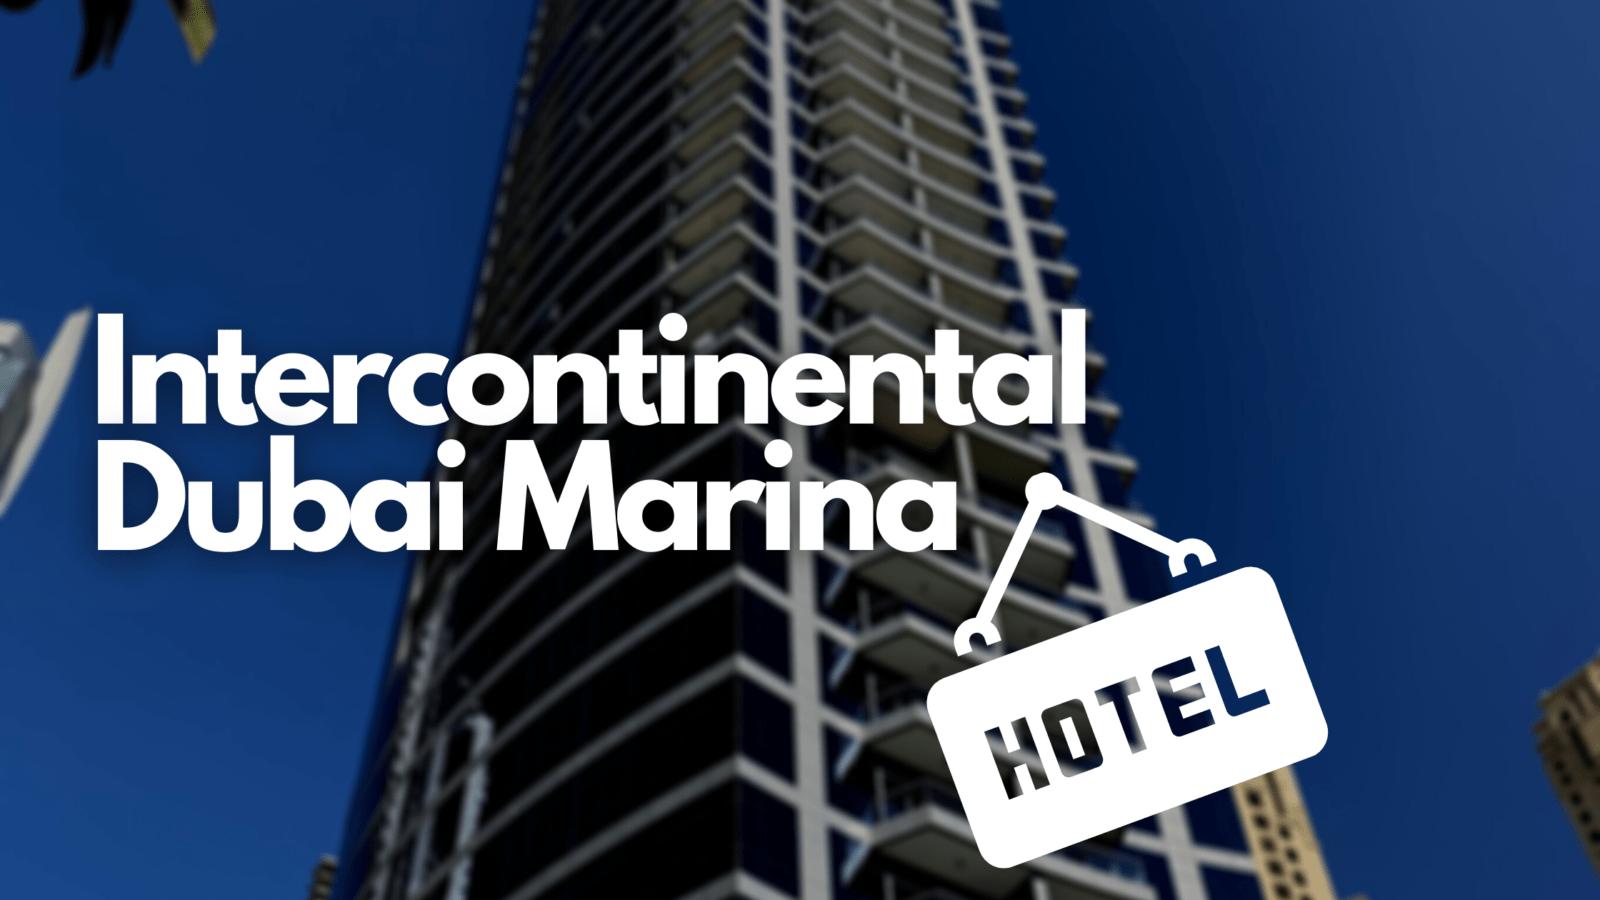 Hotel-Review: Intercontinental Dubai Marina